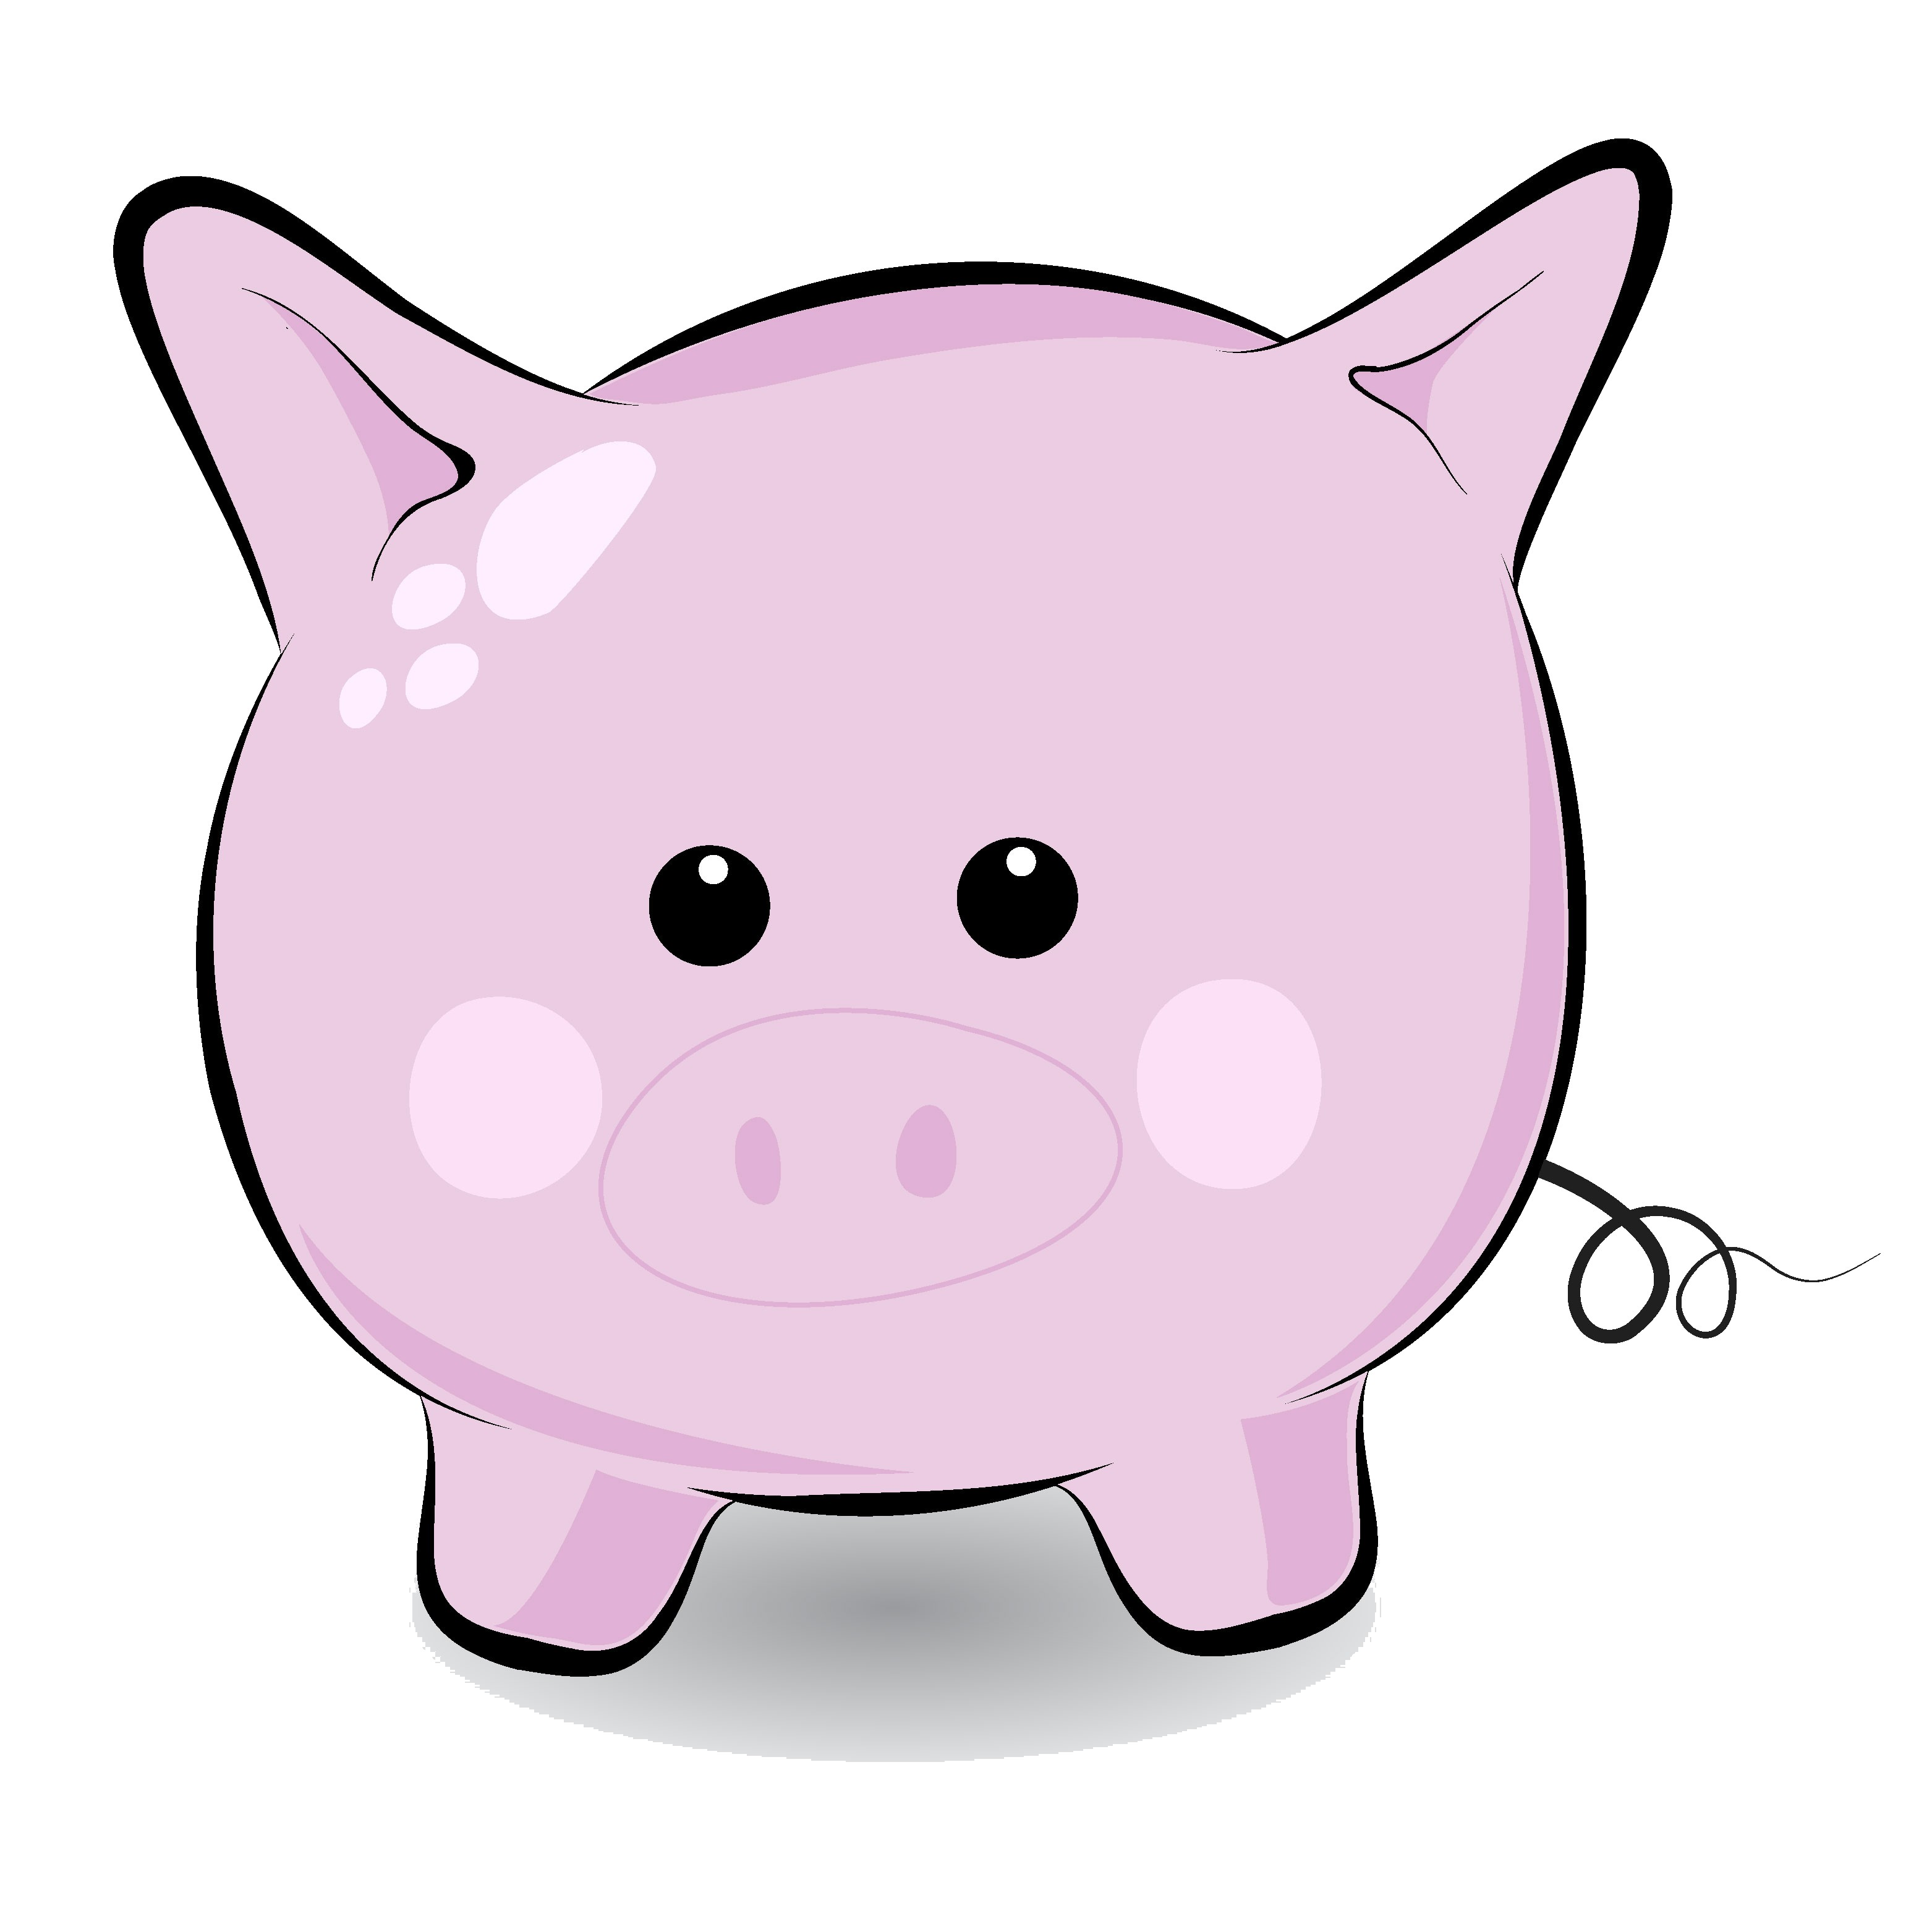 Pig clip art pictures clipart panda free clipart images pig clip art voltagebd Image collections